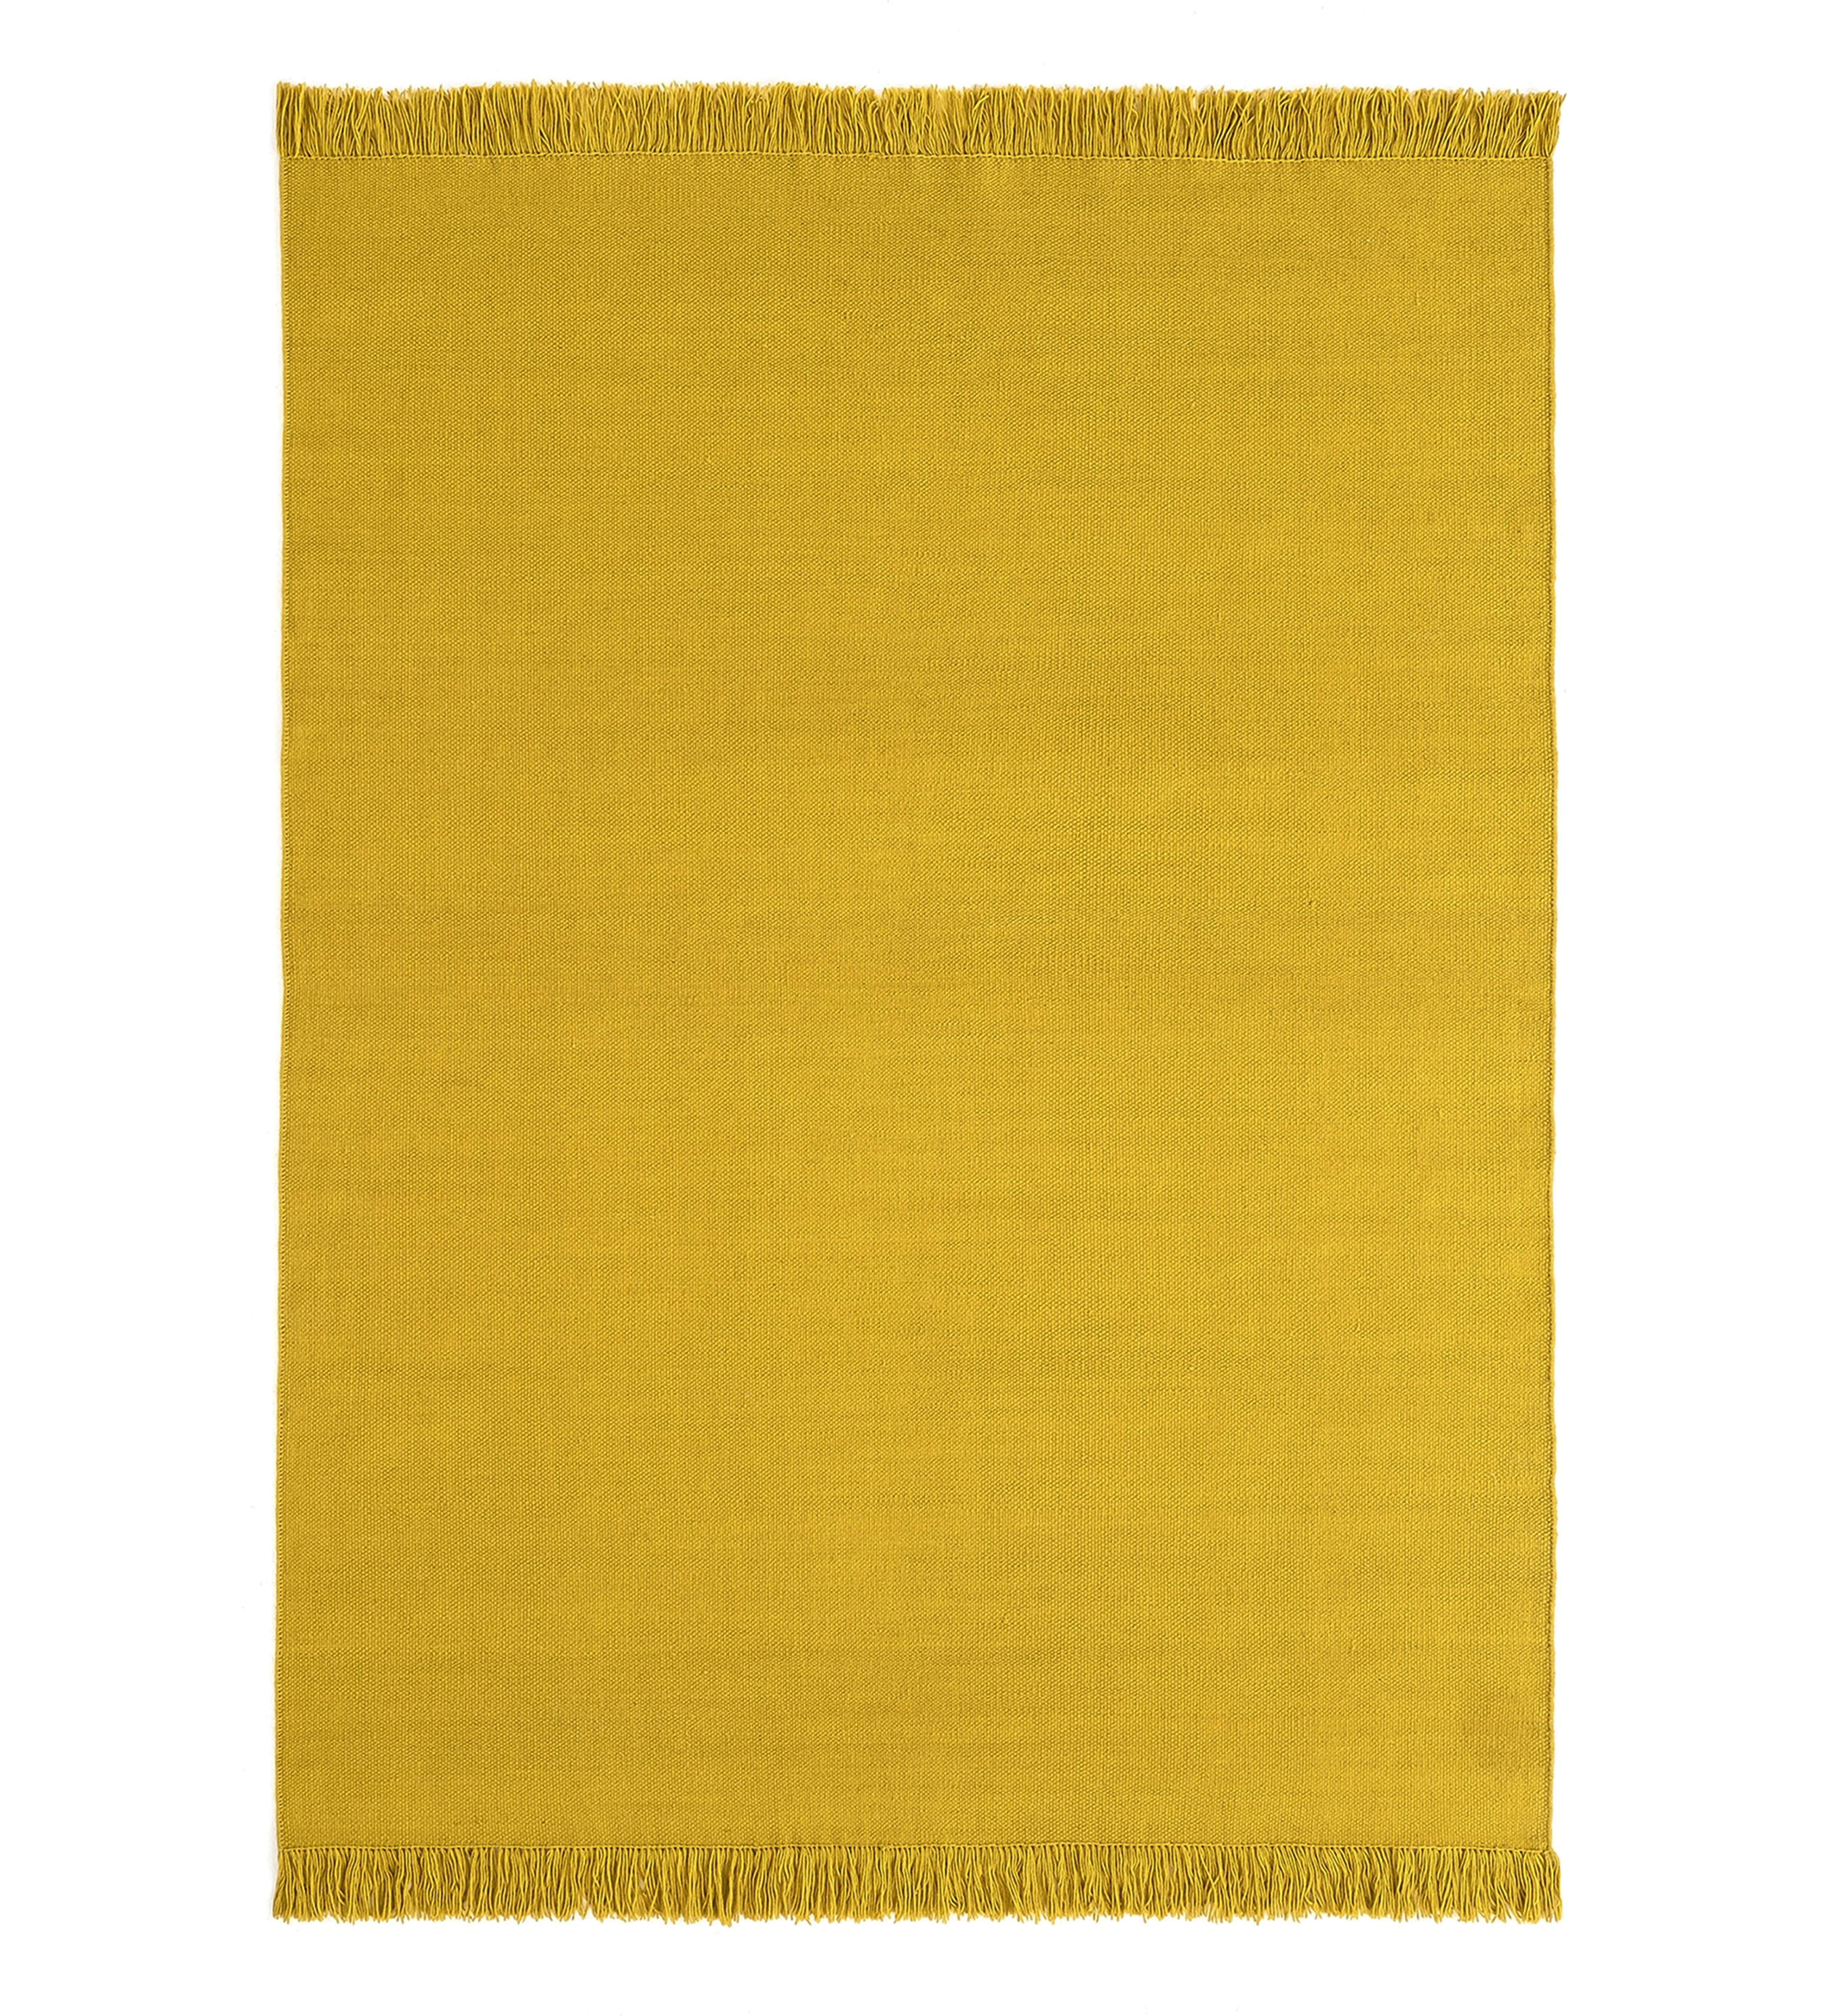 Nanimarquina Colors Nectar rug